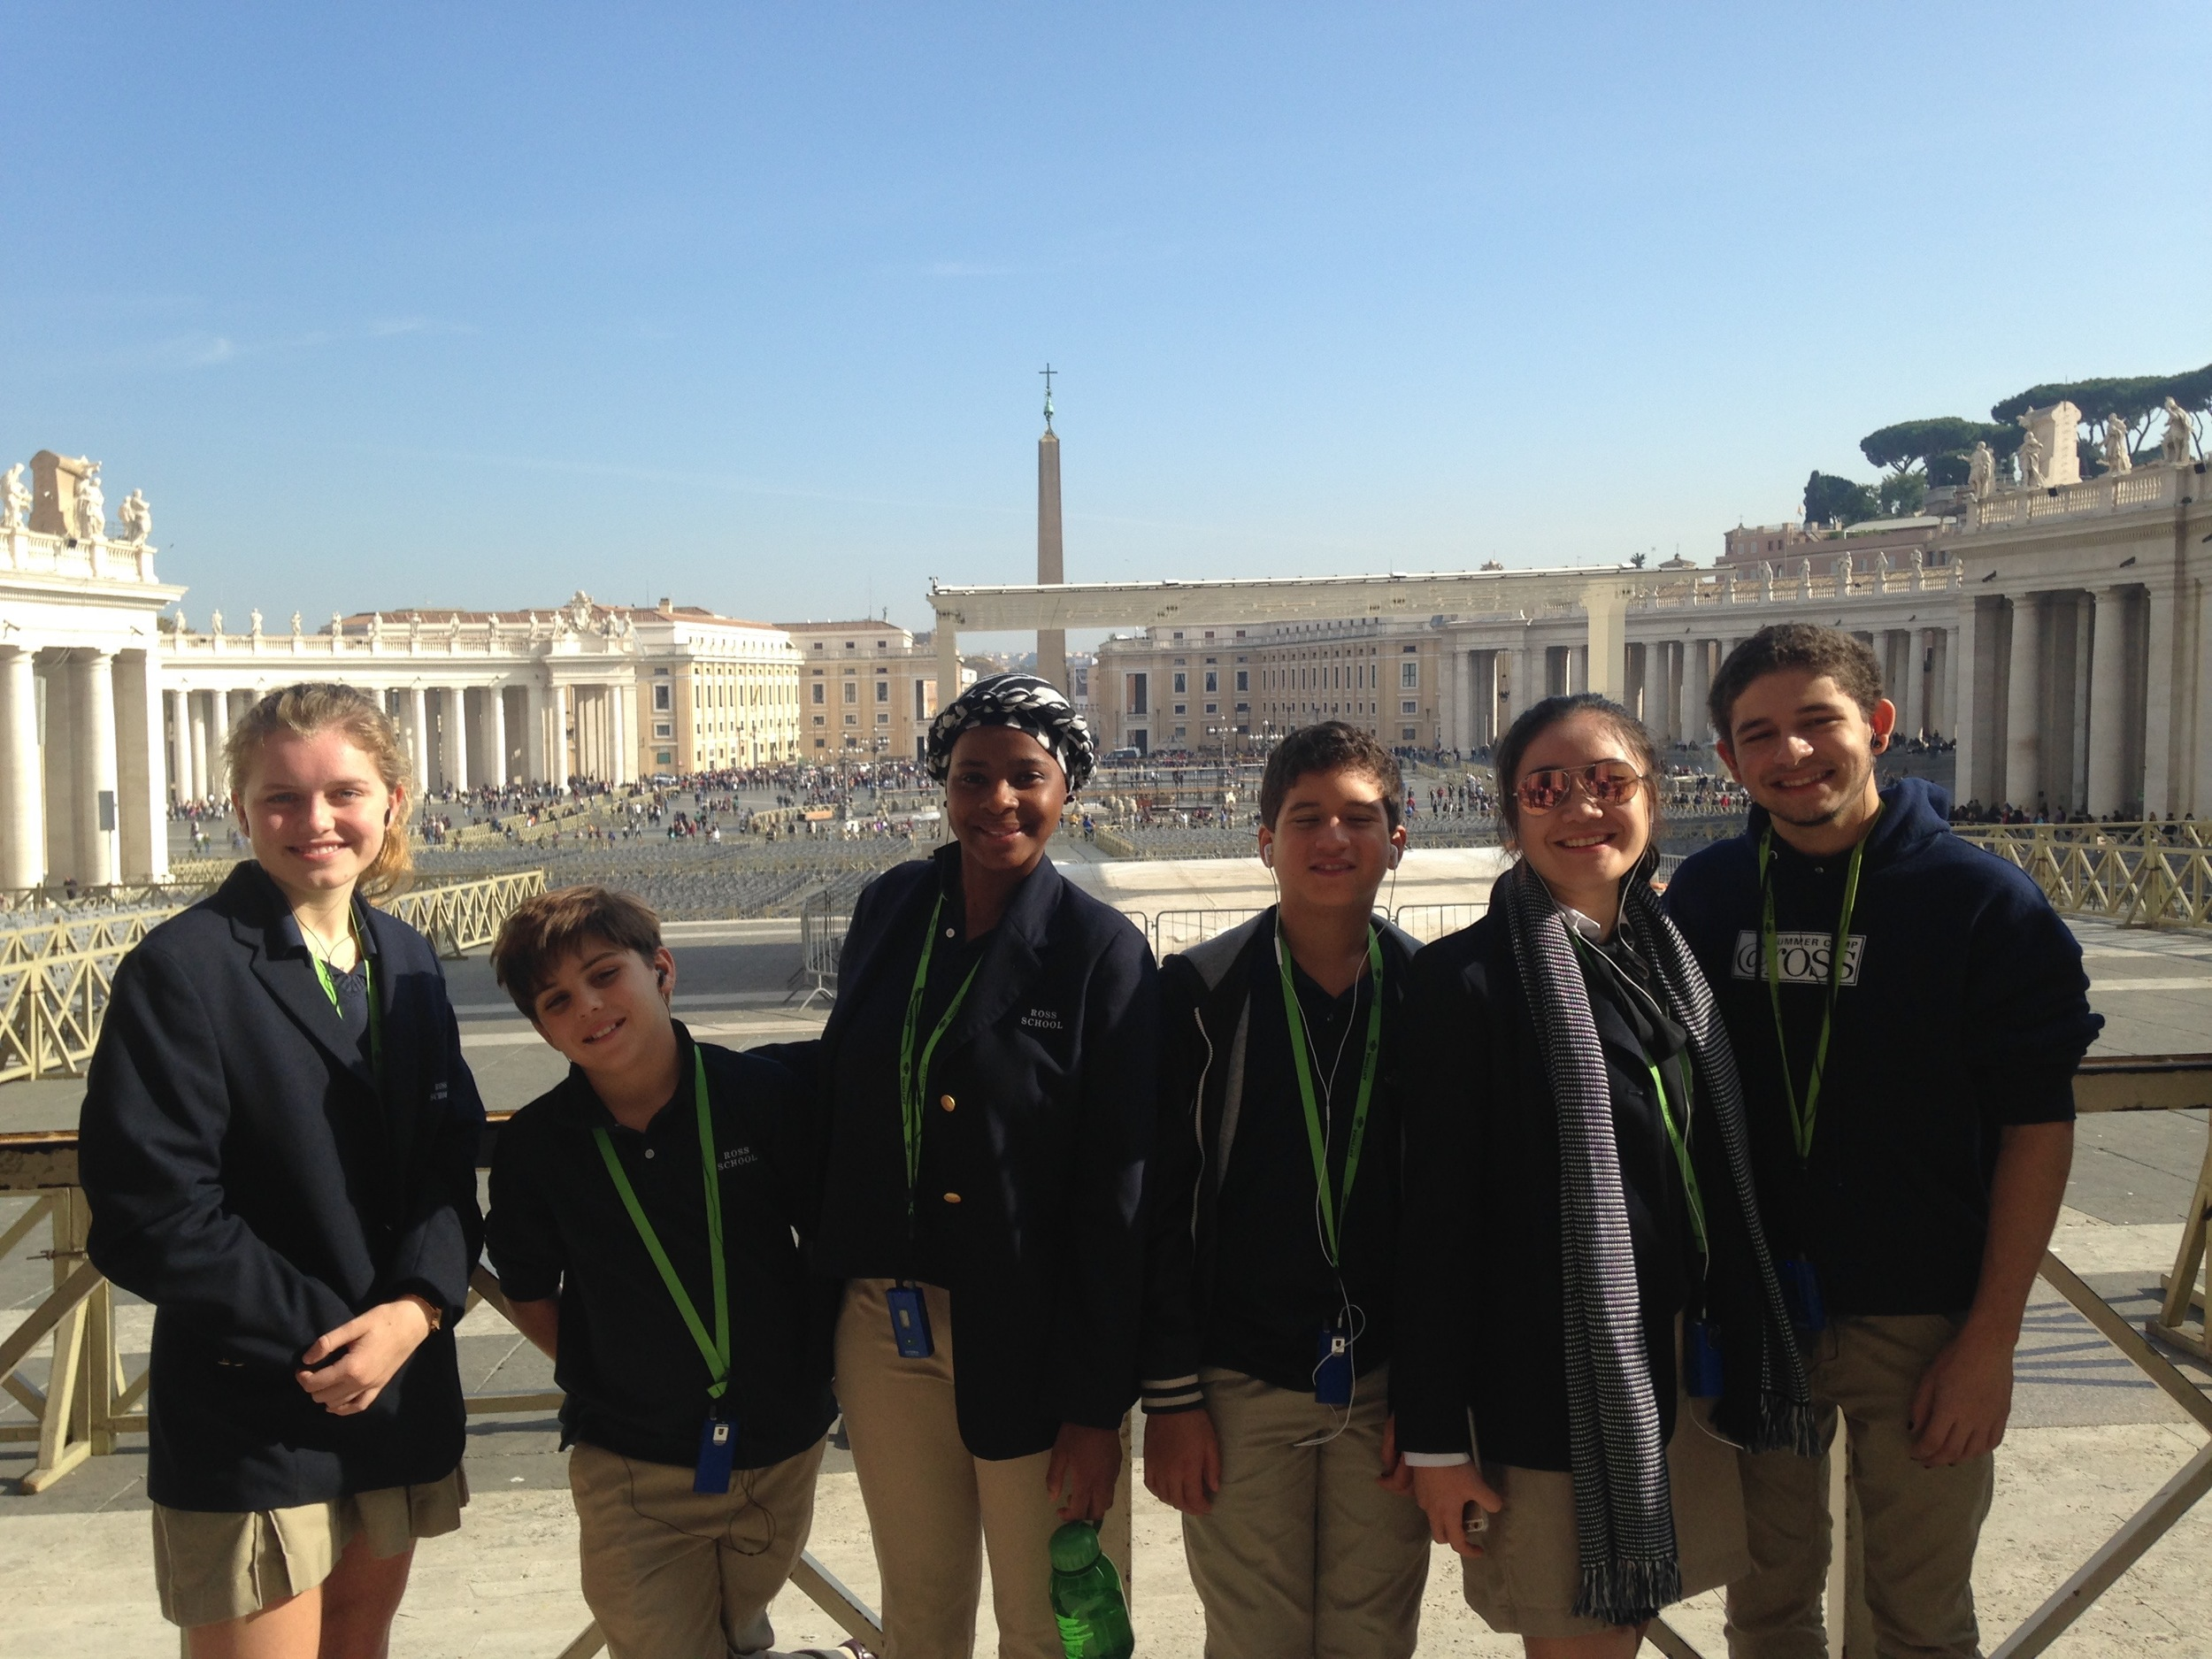 Ross Students Isabelle Rowe, Kely Archambault, Kwazi Nkomo, Diego Vanegas, Shanshan He, Malik Basnight at St. Peter's Square, Vatican City.